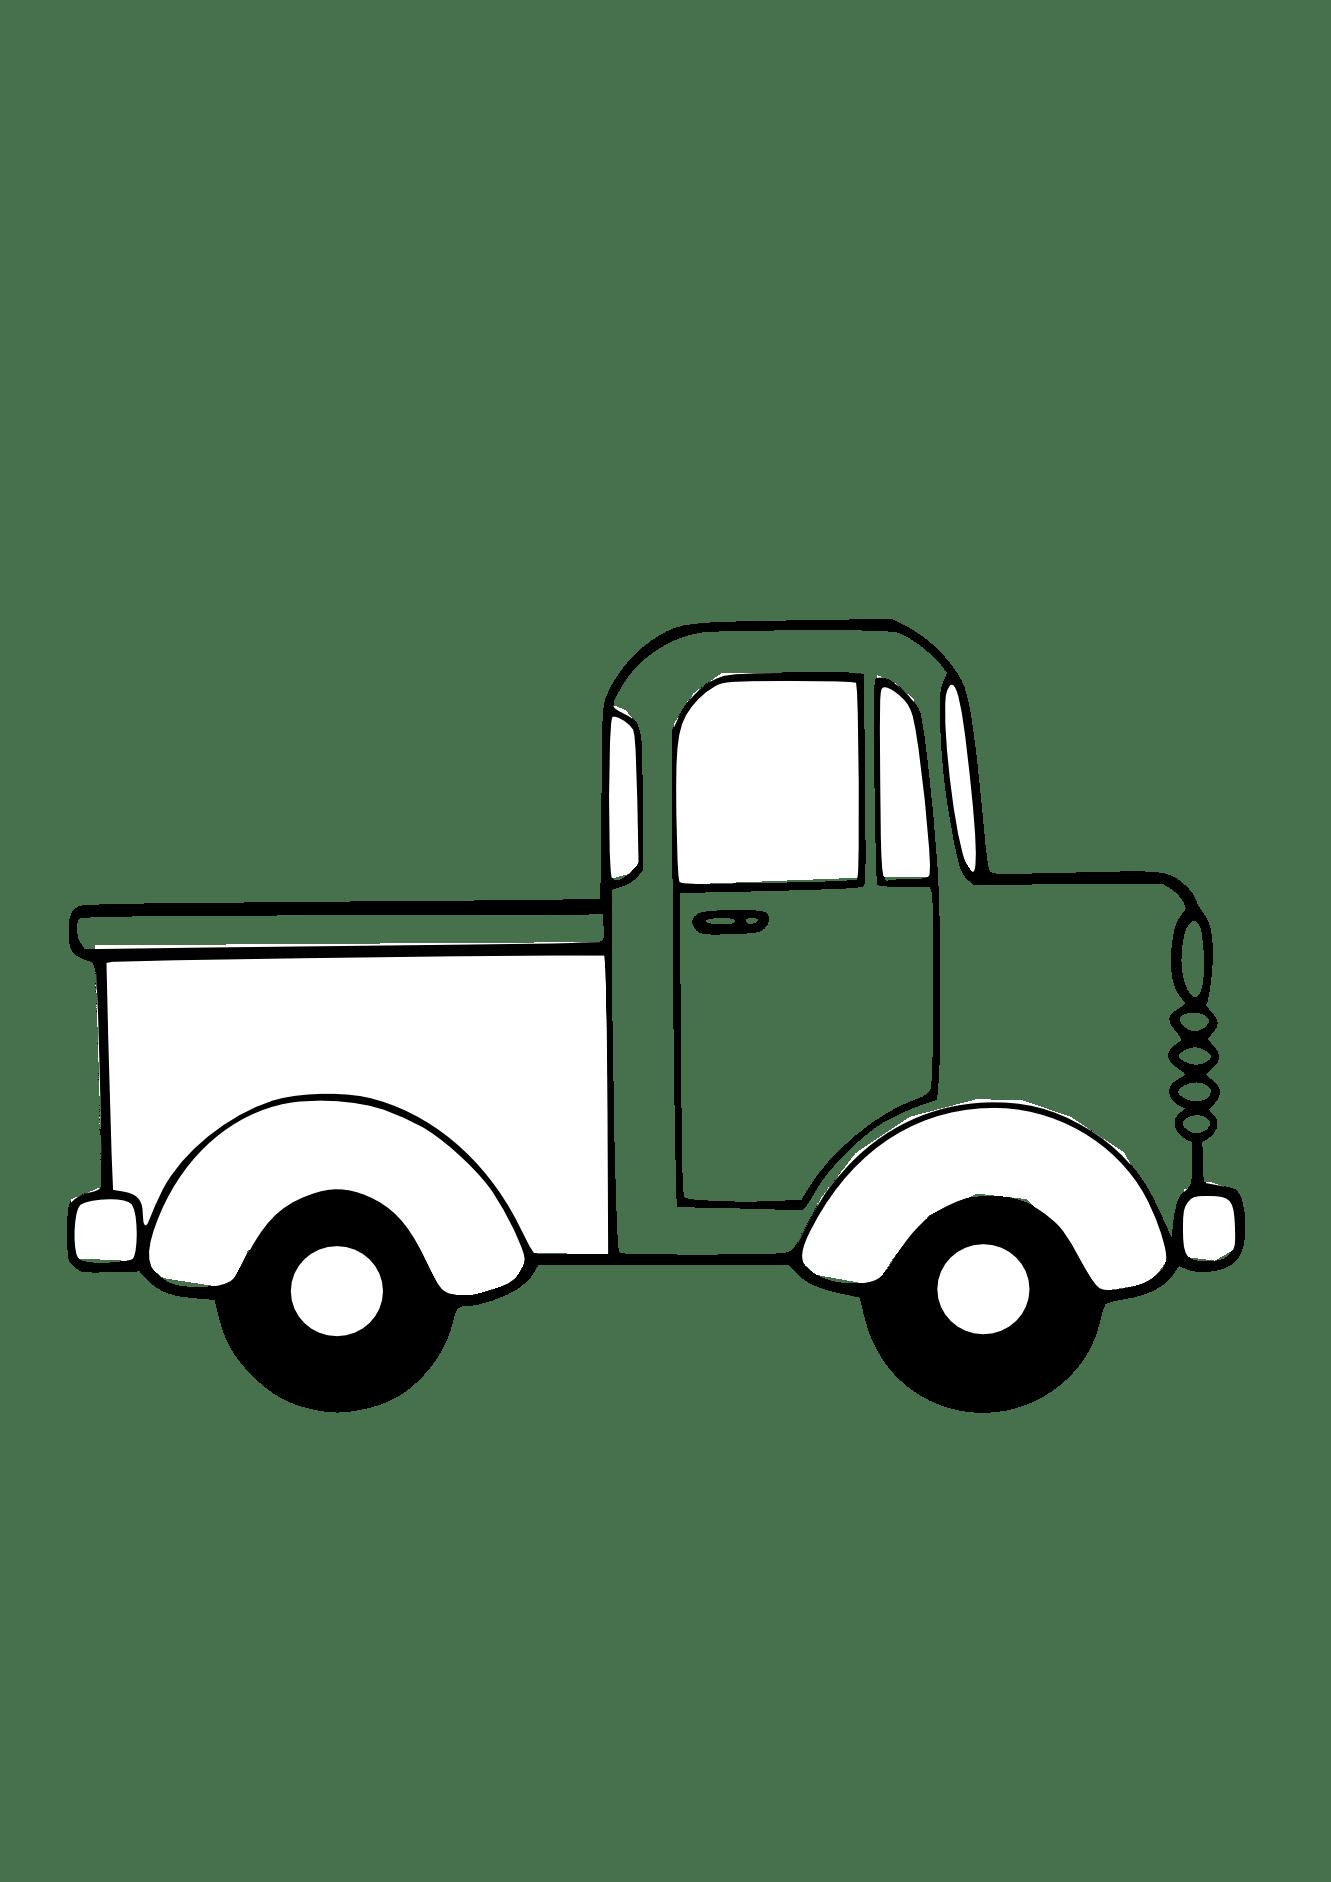 Dump Truck Clipart Black And White Clipart Panda